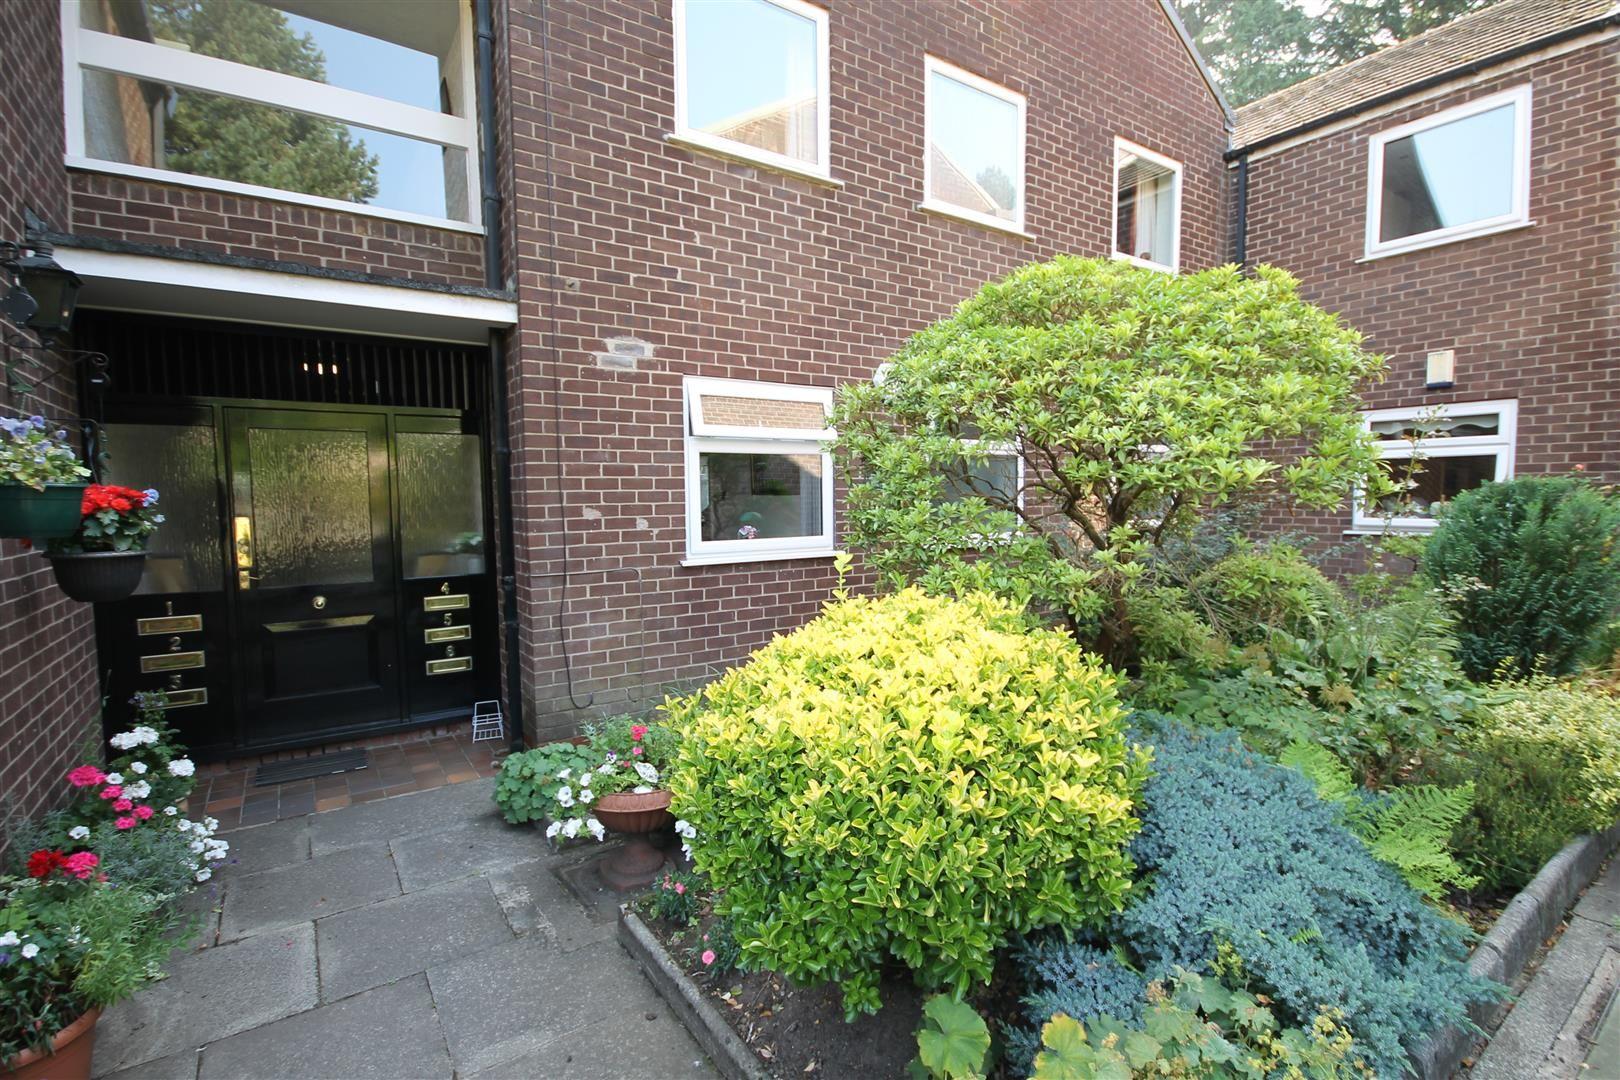 Property photo 1 of 27. Entrance